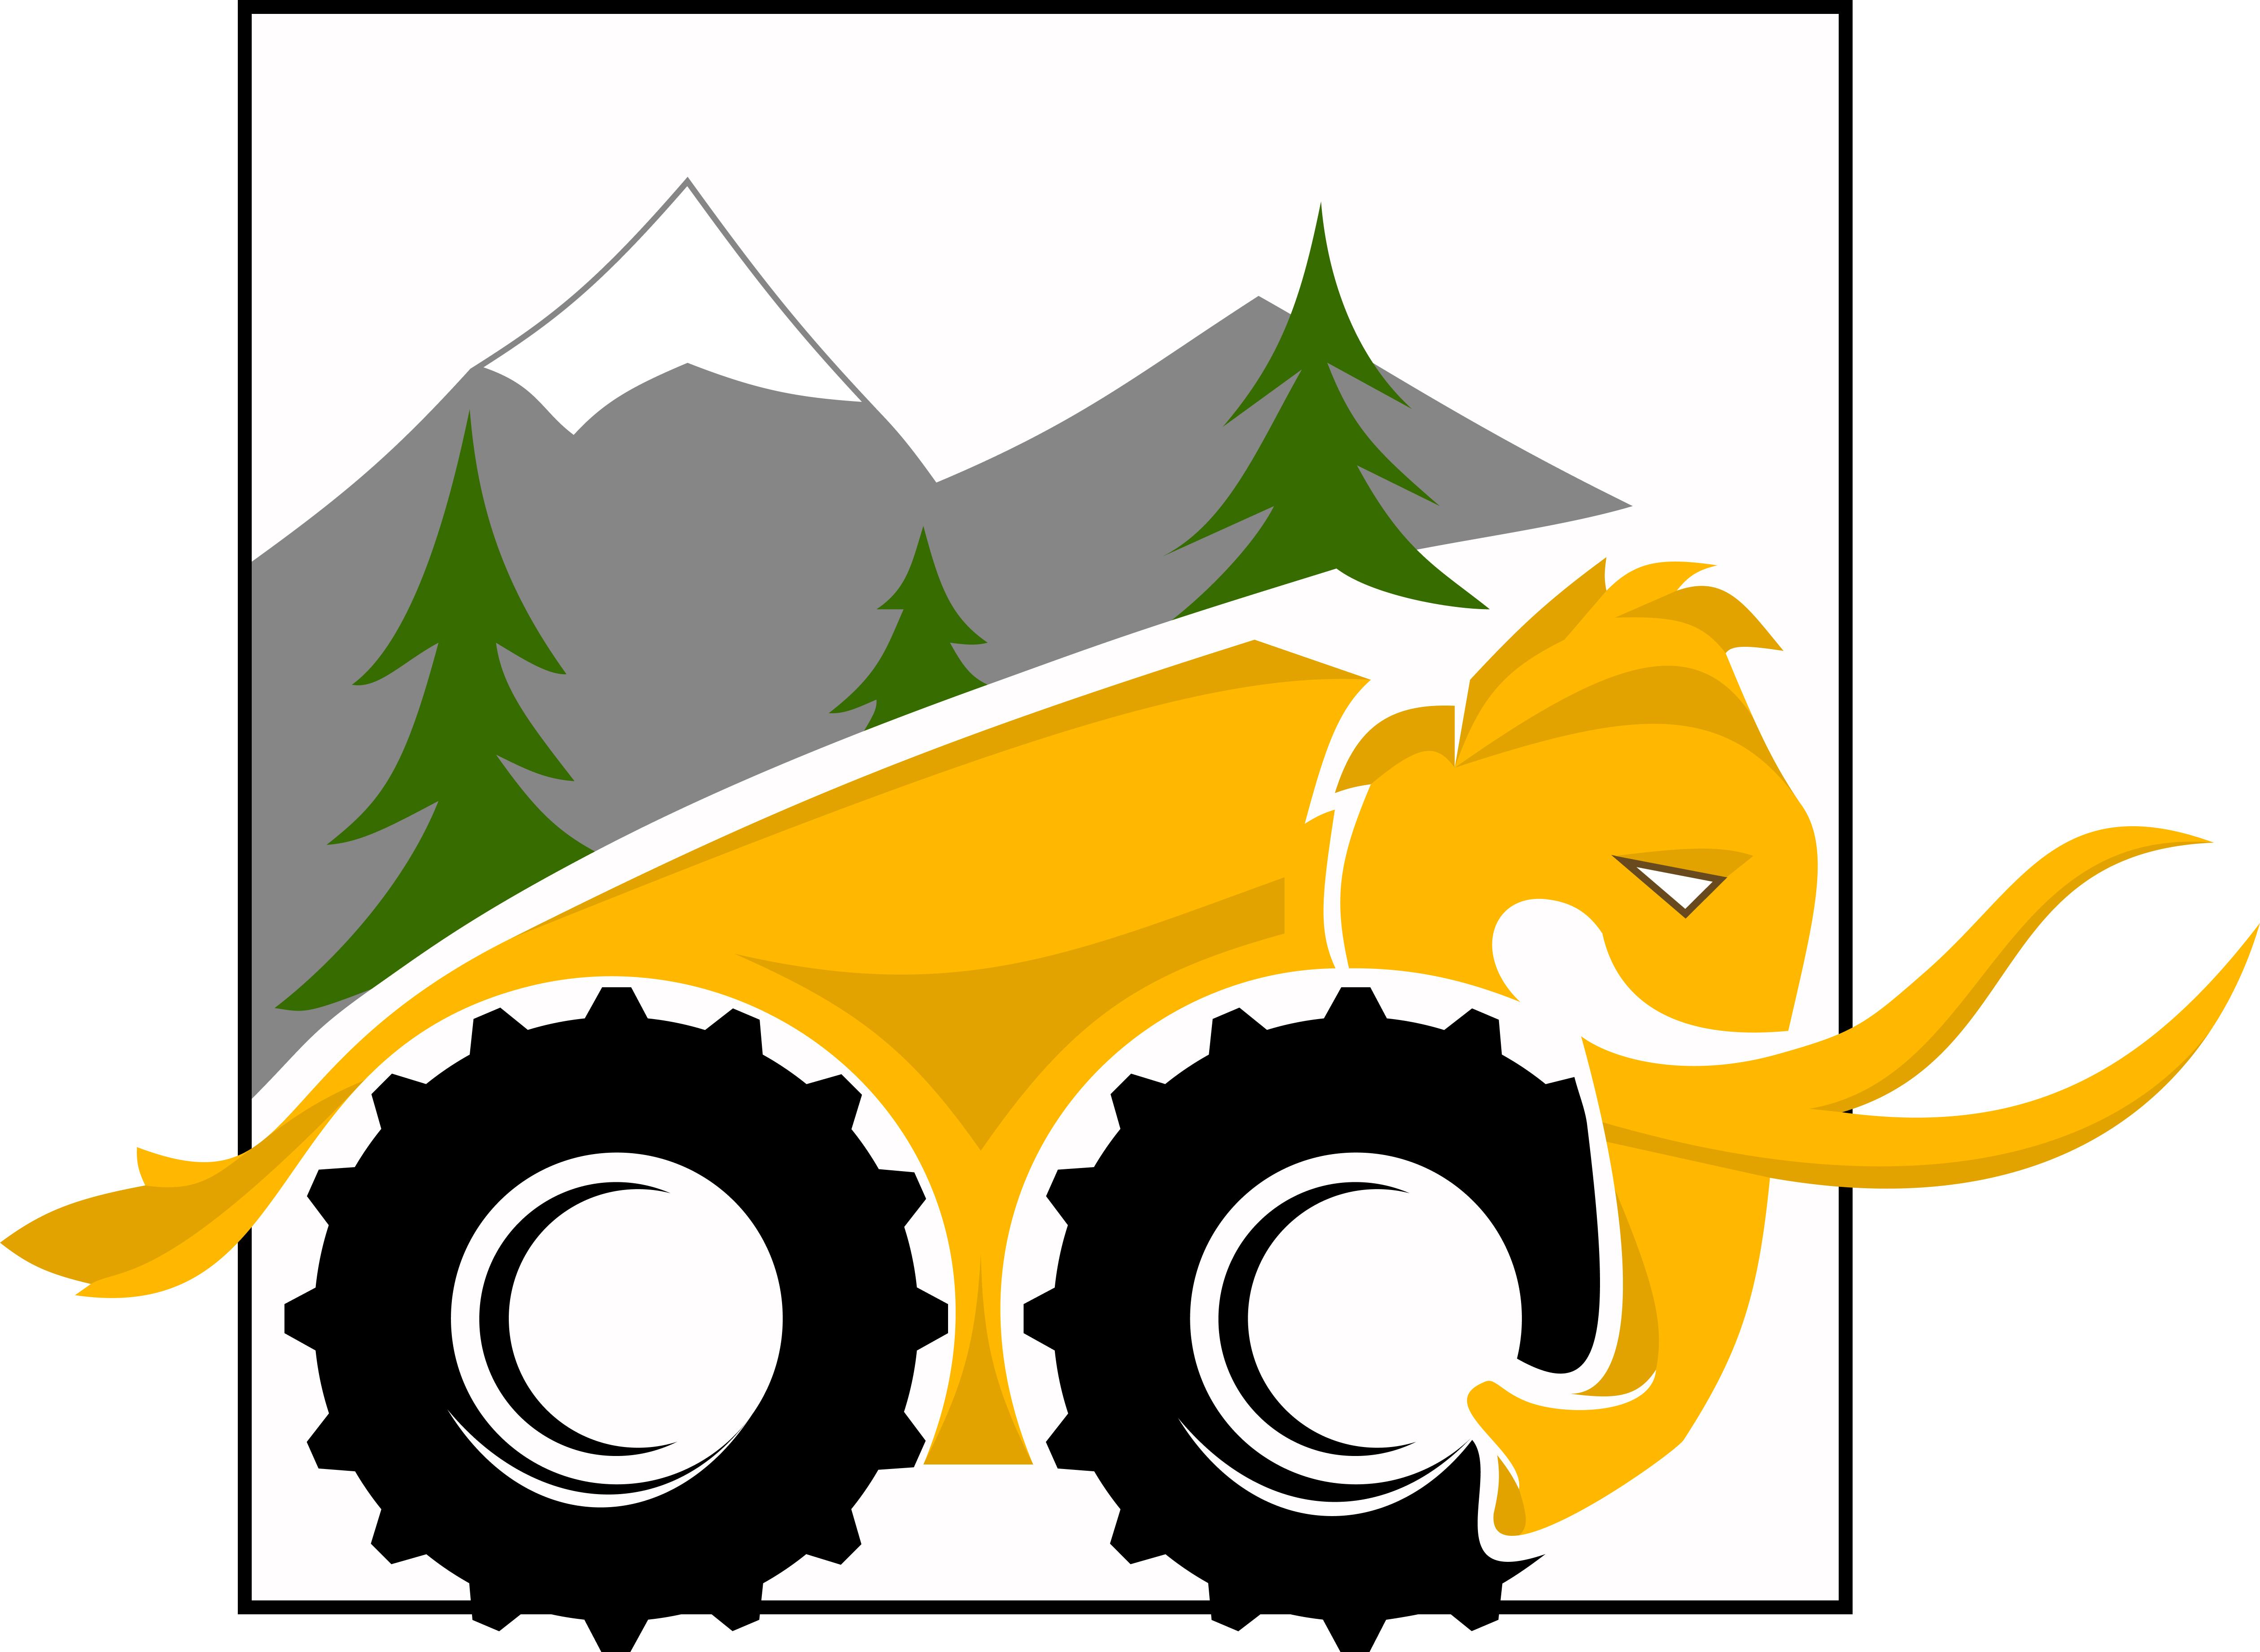 Разработать логотип для вездехода фото f_2375f87e2964a5ee.jpg